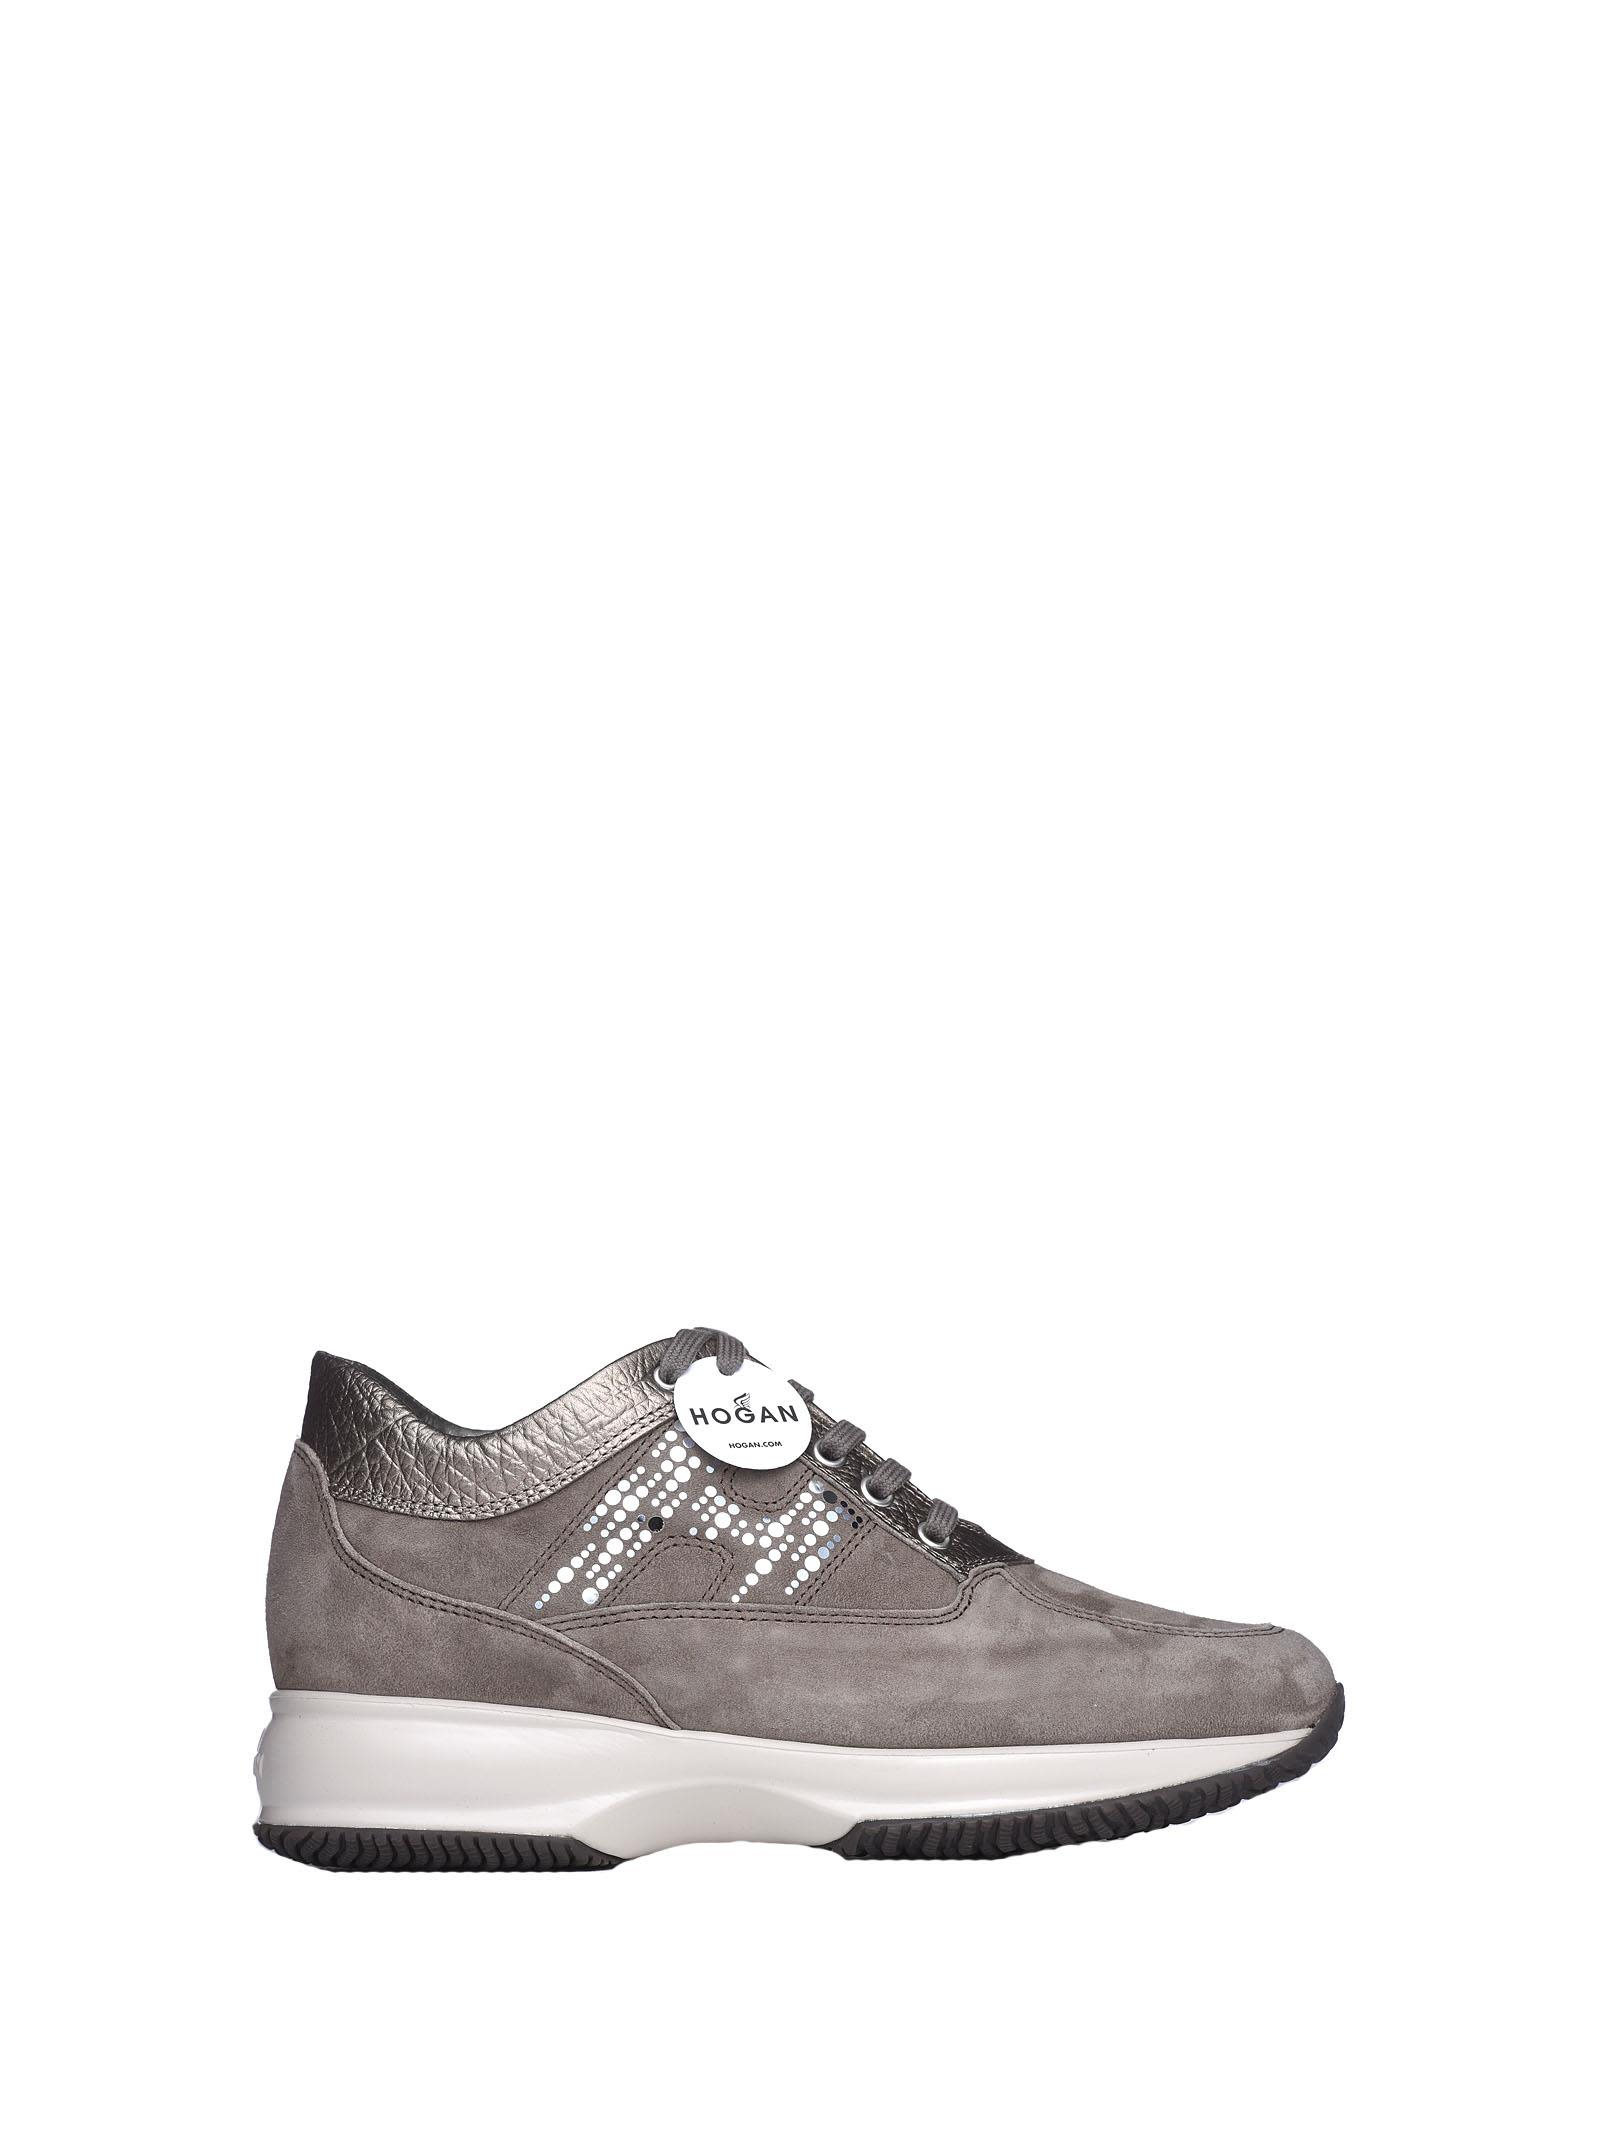 64781ce64c5 Hogan Hogan Interactive Brown Sneakers - PALUDE TORBA - 10704088 ...